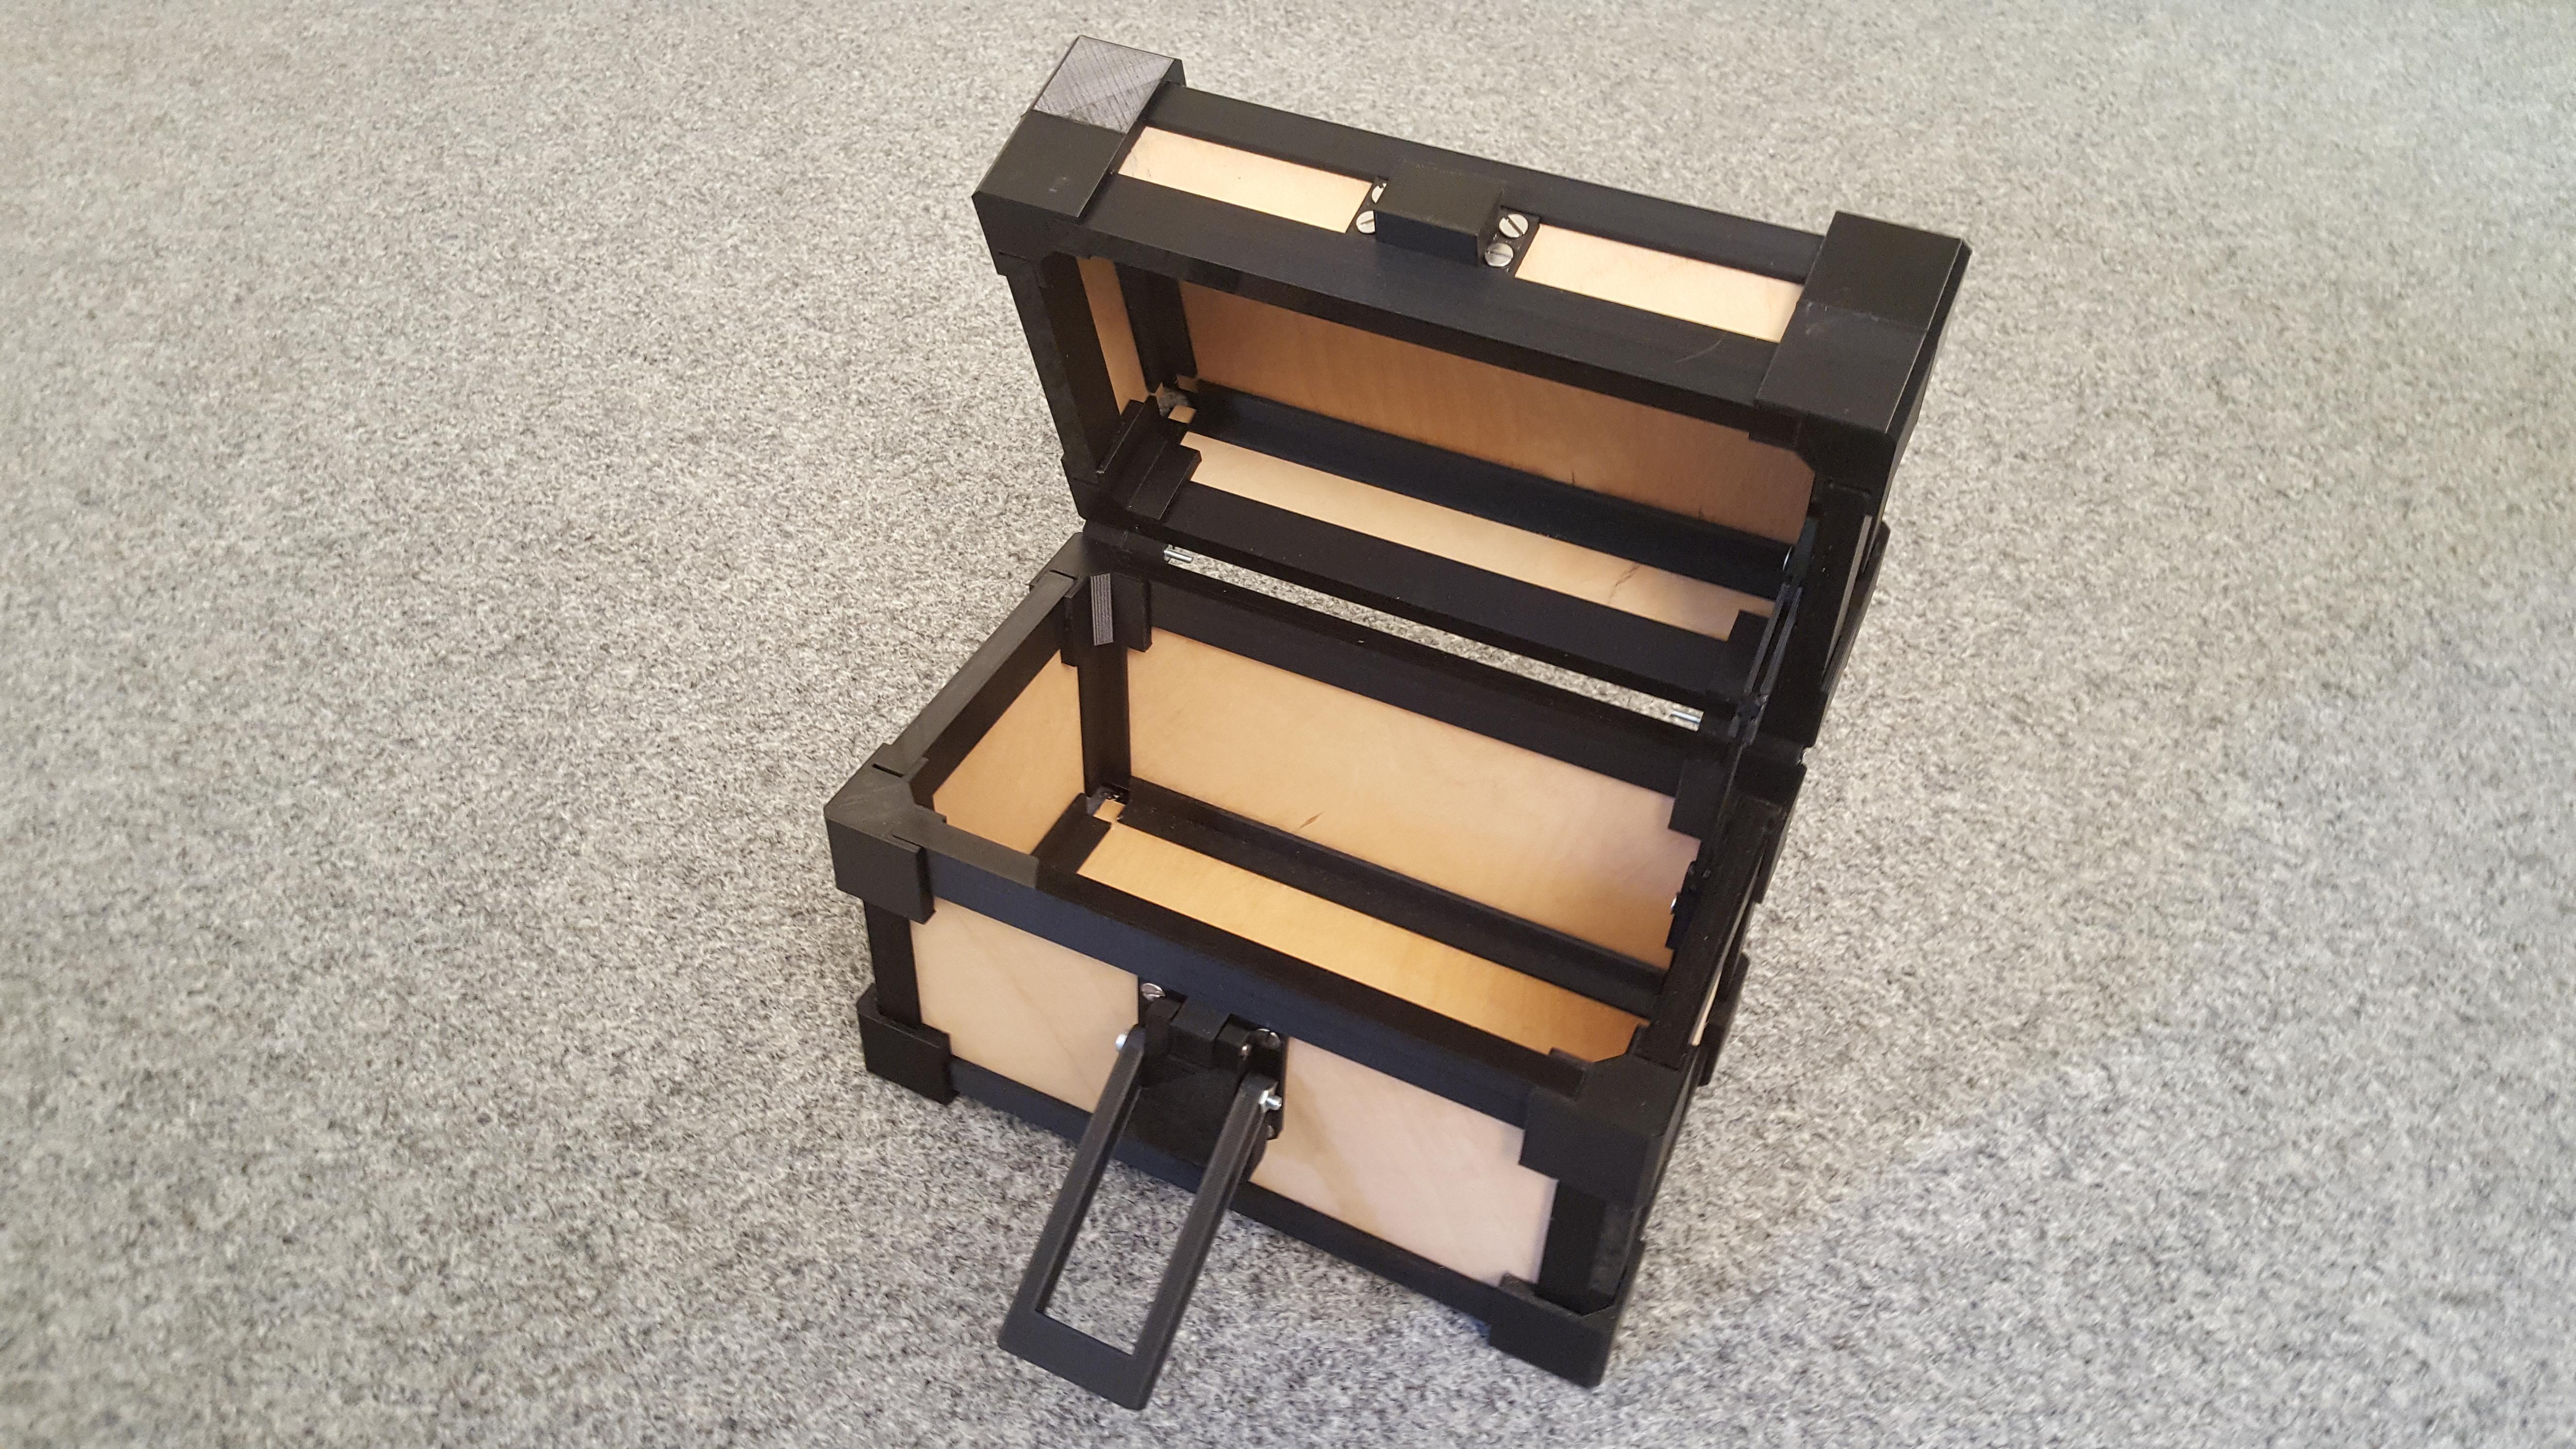 20190818_164335.jpg Download STL file LazyMans Box • Model to 3D print, Job